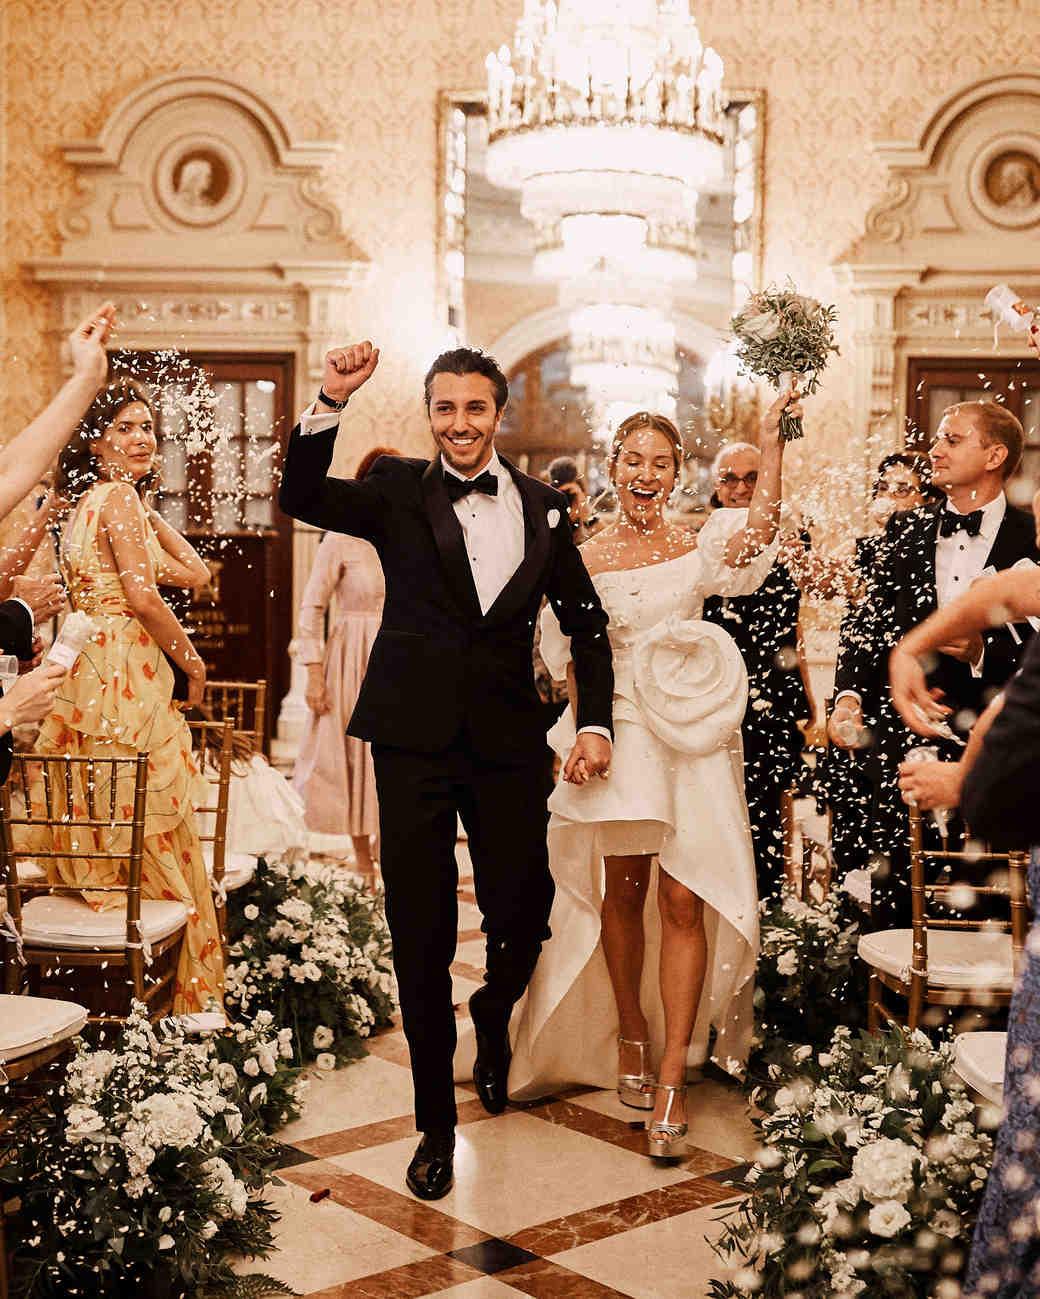 karolina sorab wedding couple recessional